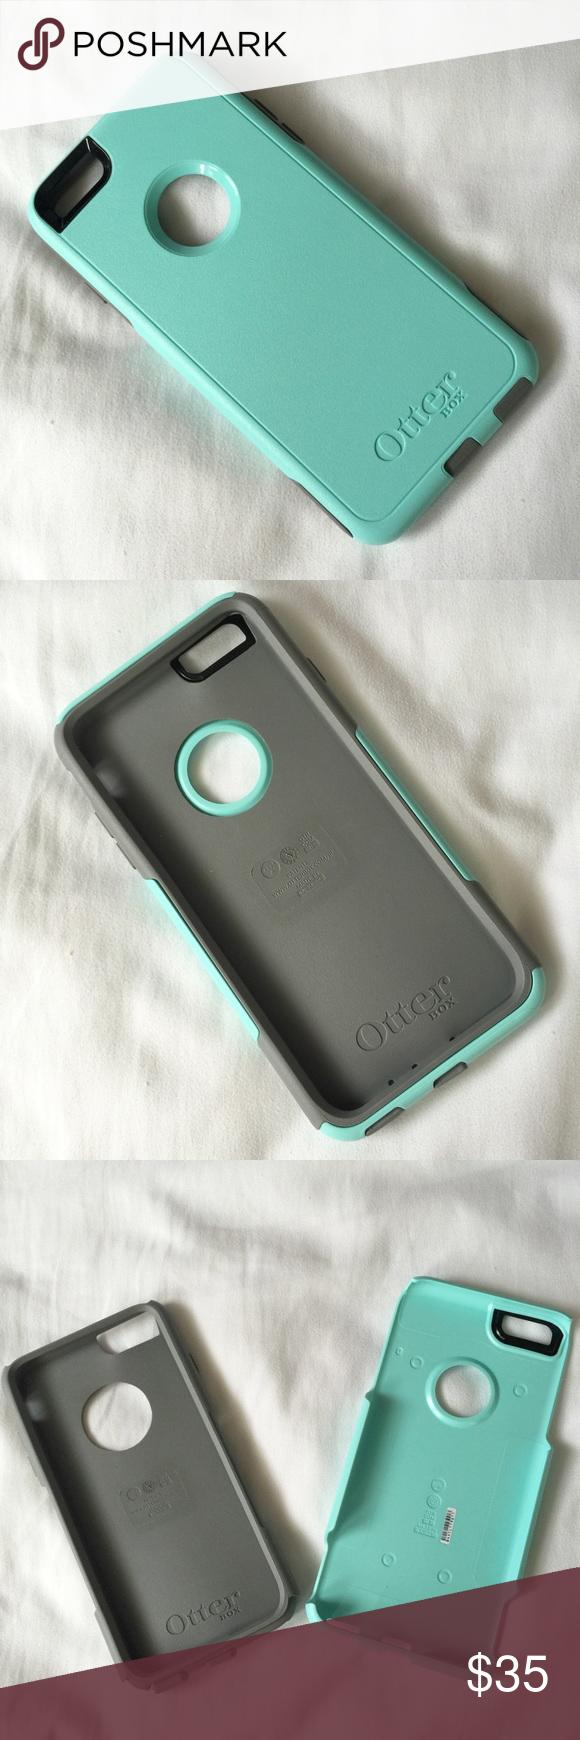 Nwot 6 Plus 6s Otterbox Commuter Brand New Defender Series Iphone Neon Rose Case For Aqua Gunmetal Grey Color